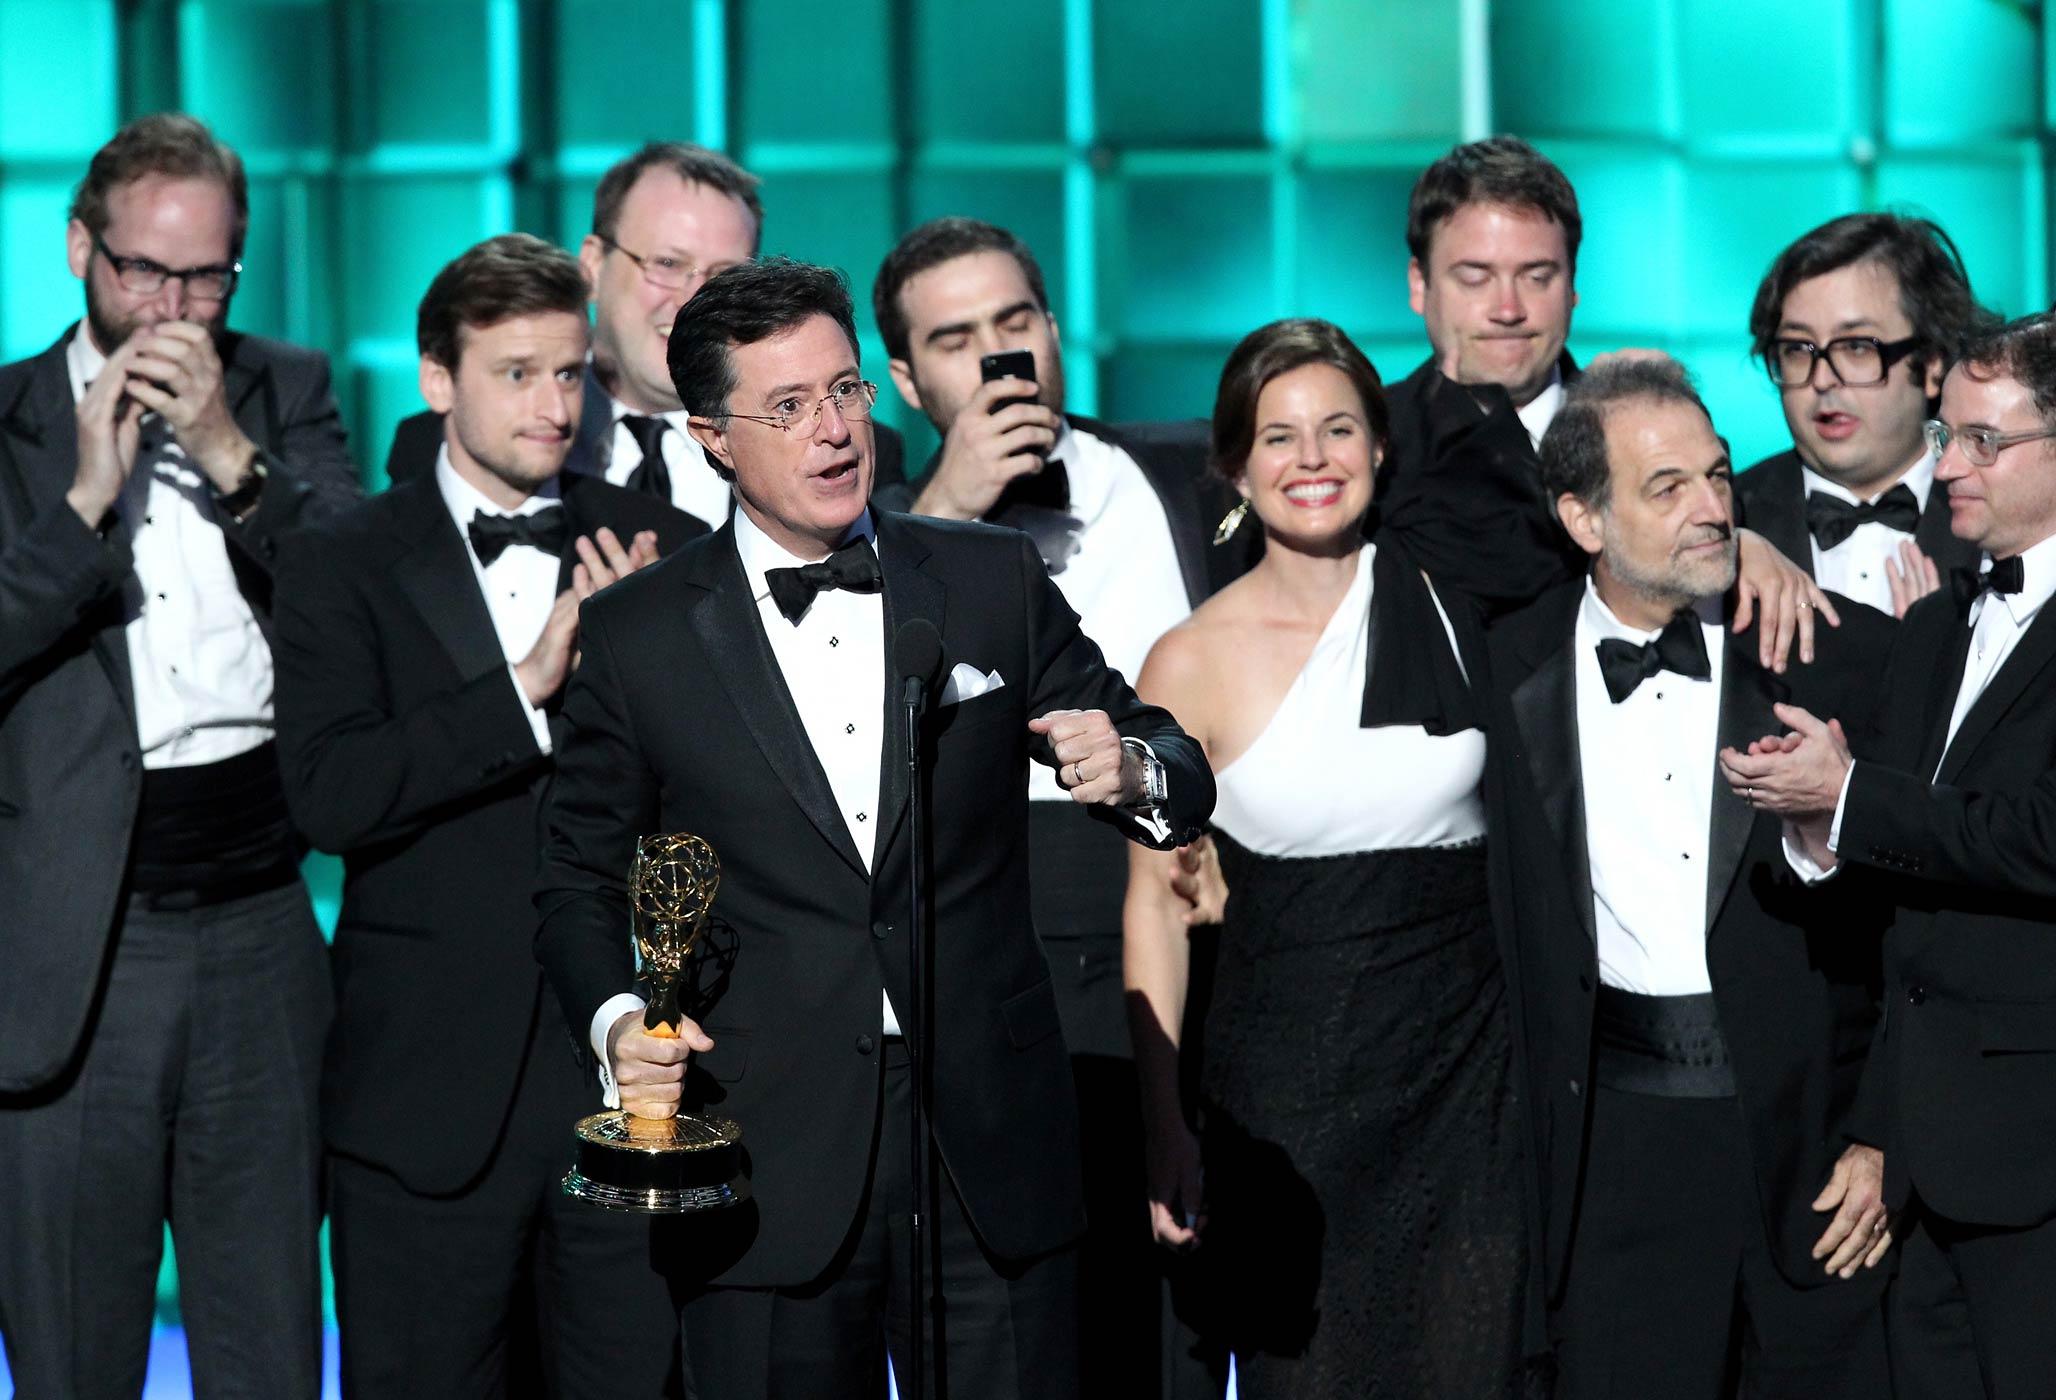 65th Annual Primetime Emmy Awards - CBS Show